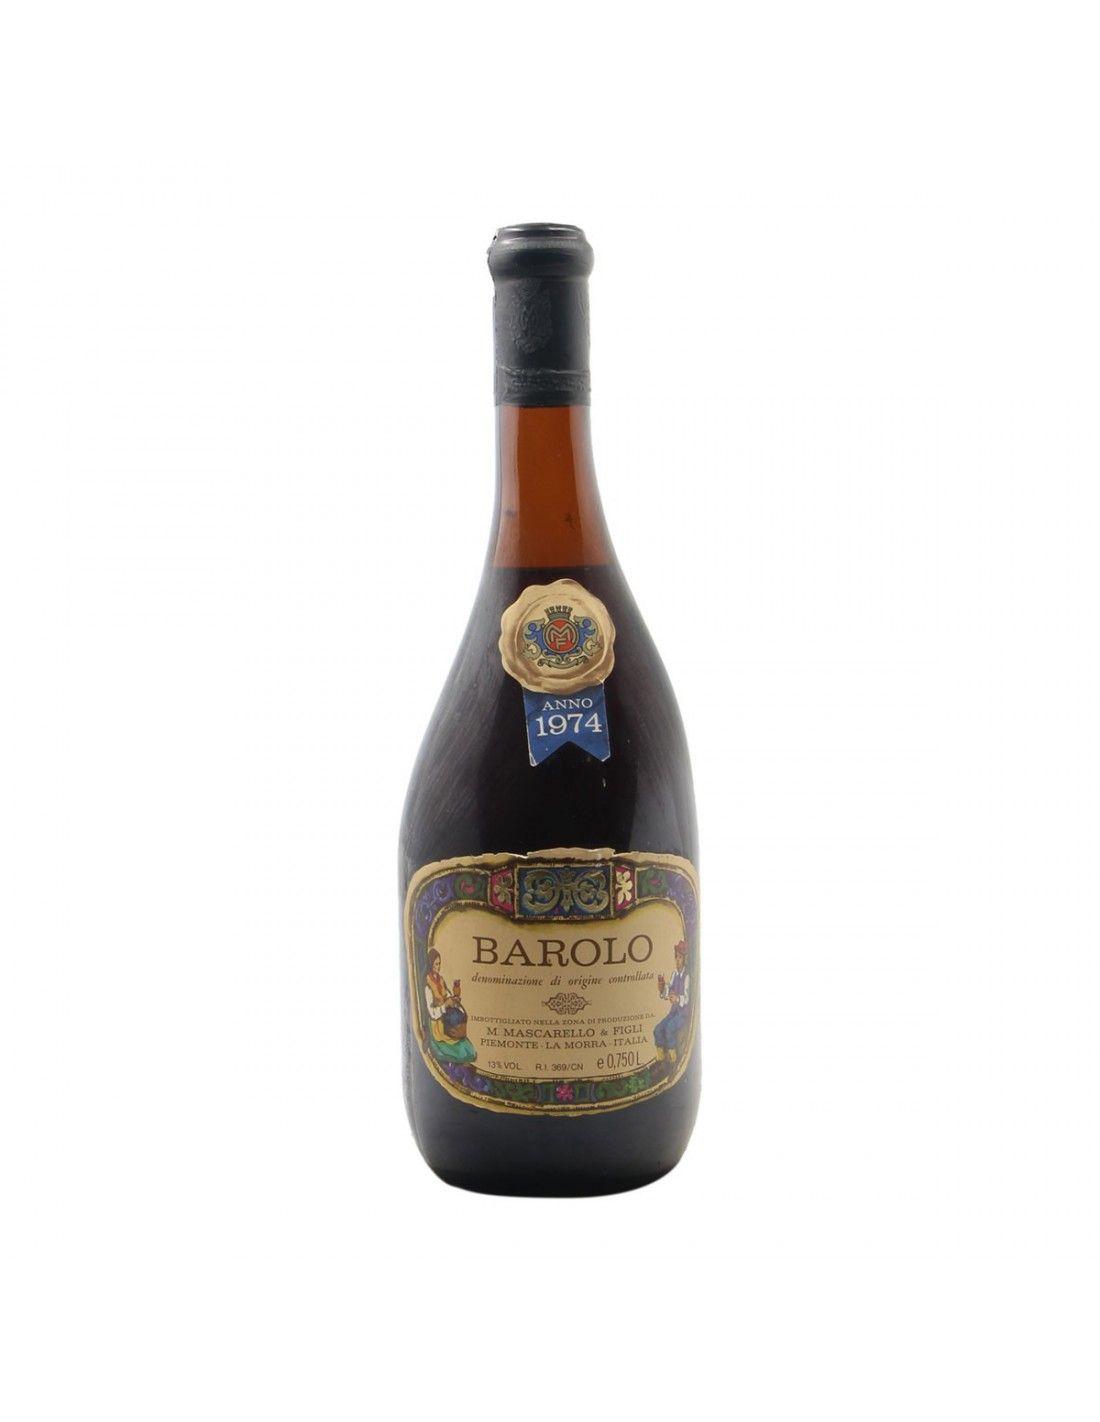 BAROLO 1974 MASCARELLO MAURO Grandi Bottiglie